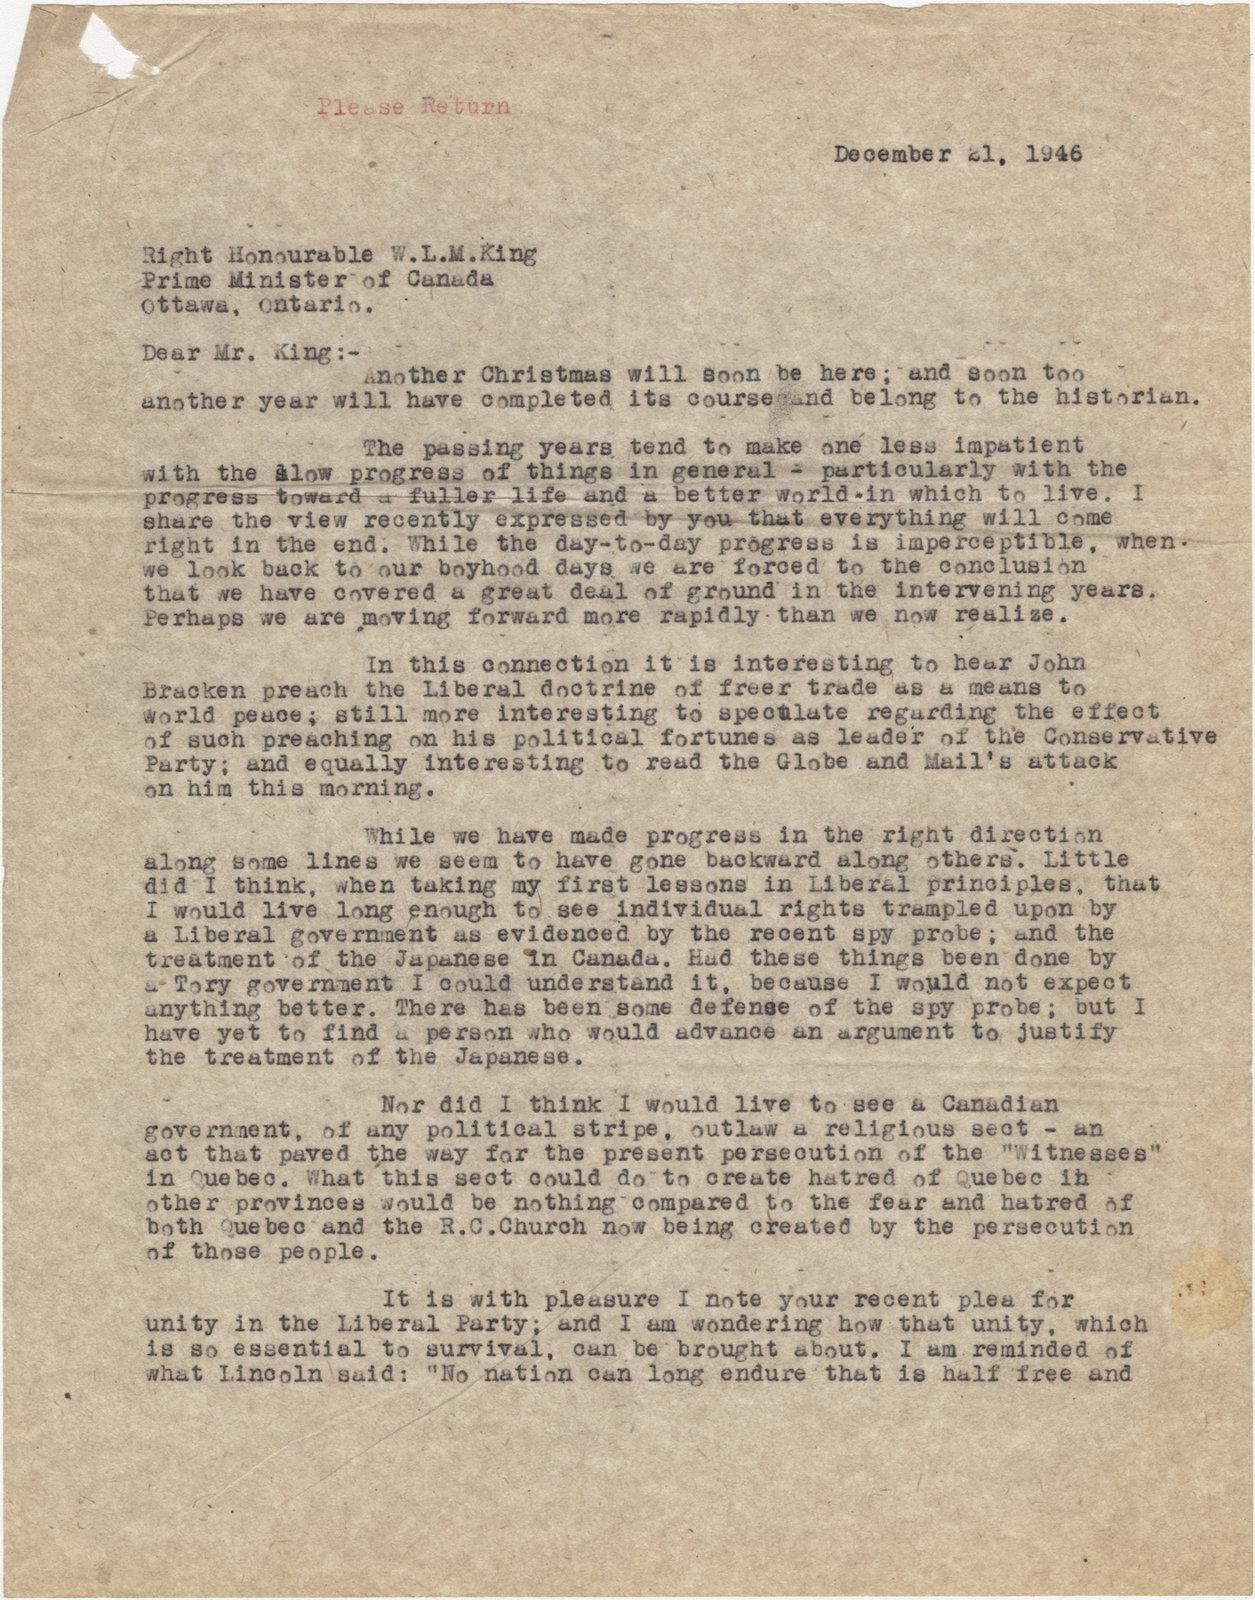 Letter from C. Mortimer Bezeau to William Lyon Mackenzie King, December 21, 1946